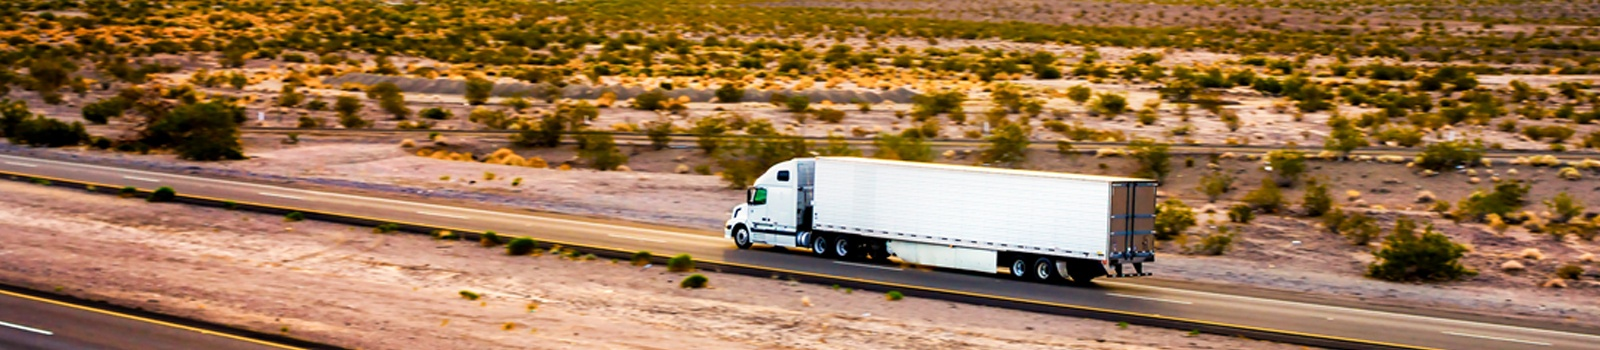 Transportation White Semi Truck Highway